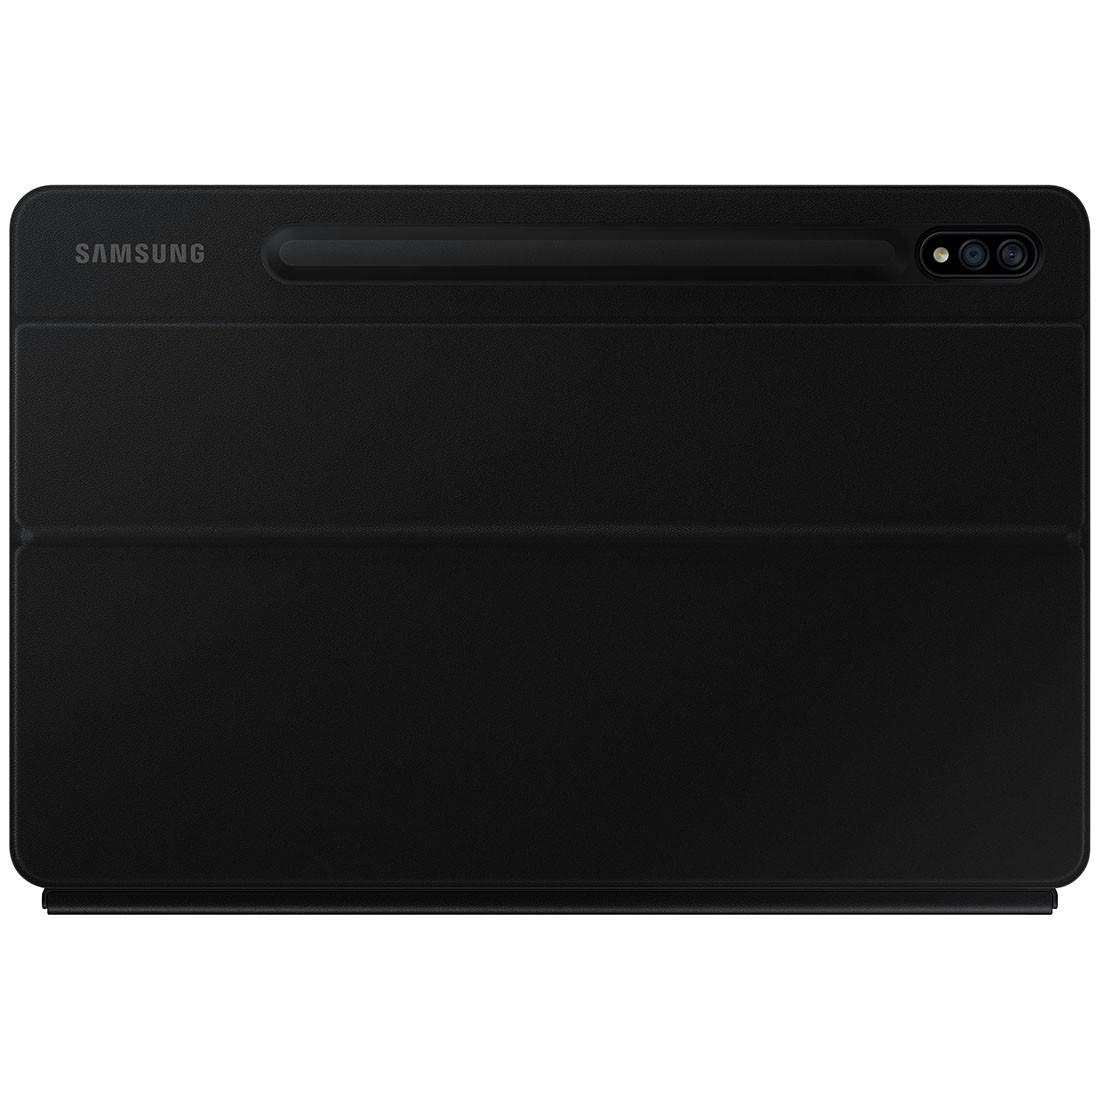 "Capa Teclado Original Samsung Galaxy Tab S7 11"" SM-T870 e T875 - Tablet não incluso  - HARS"